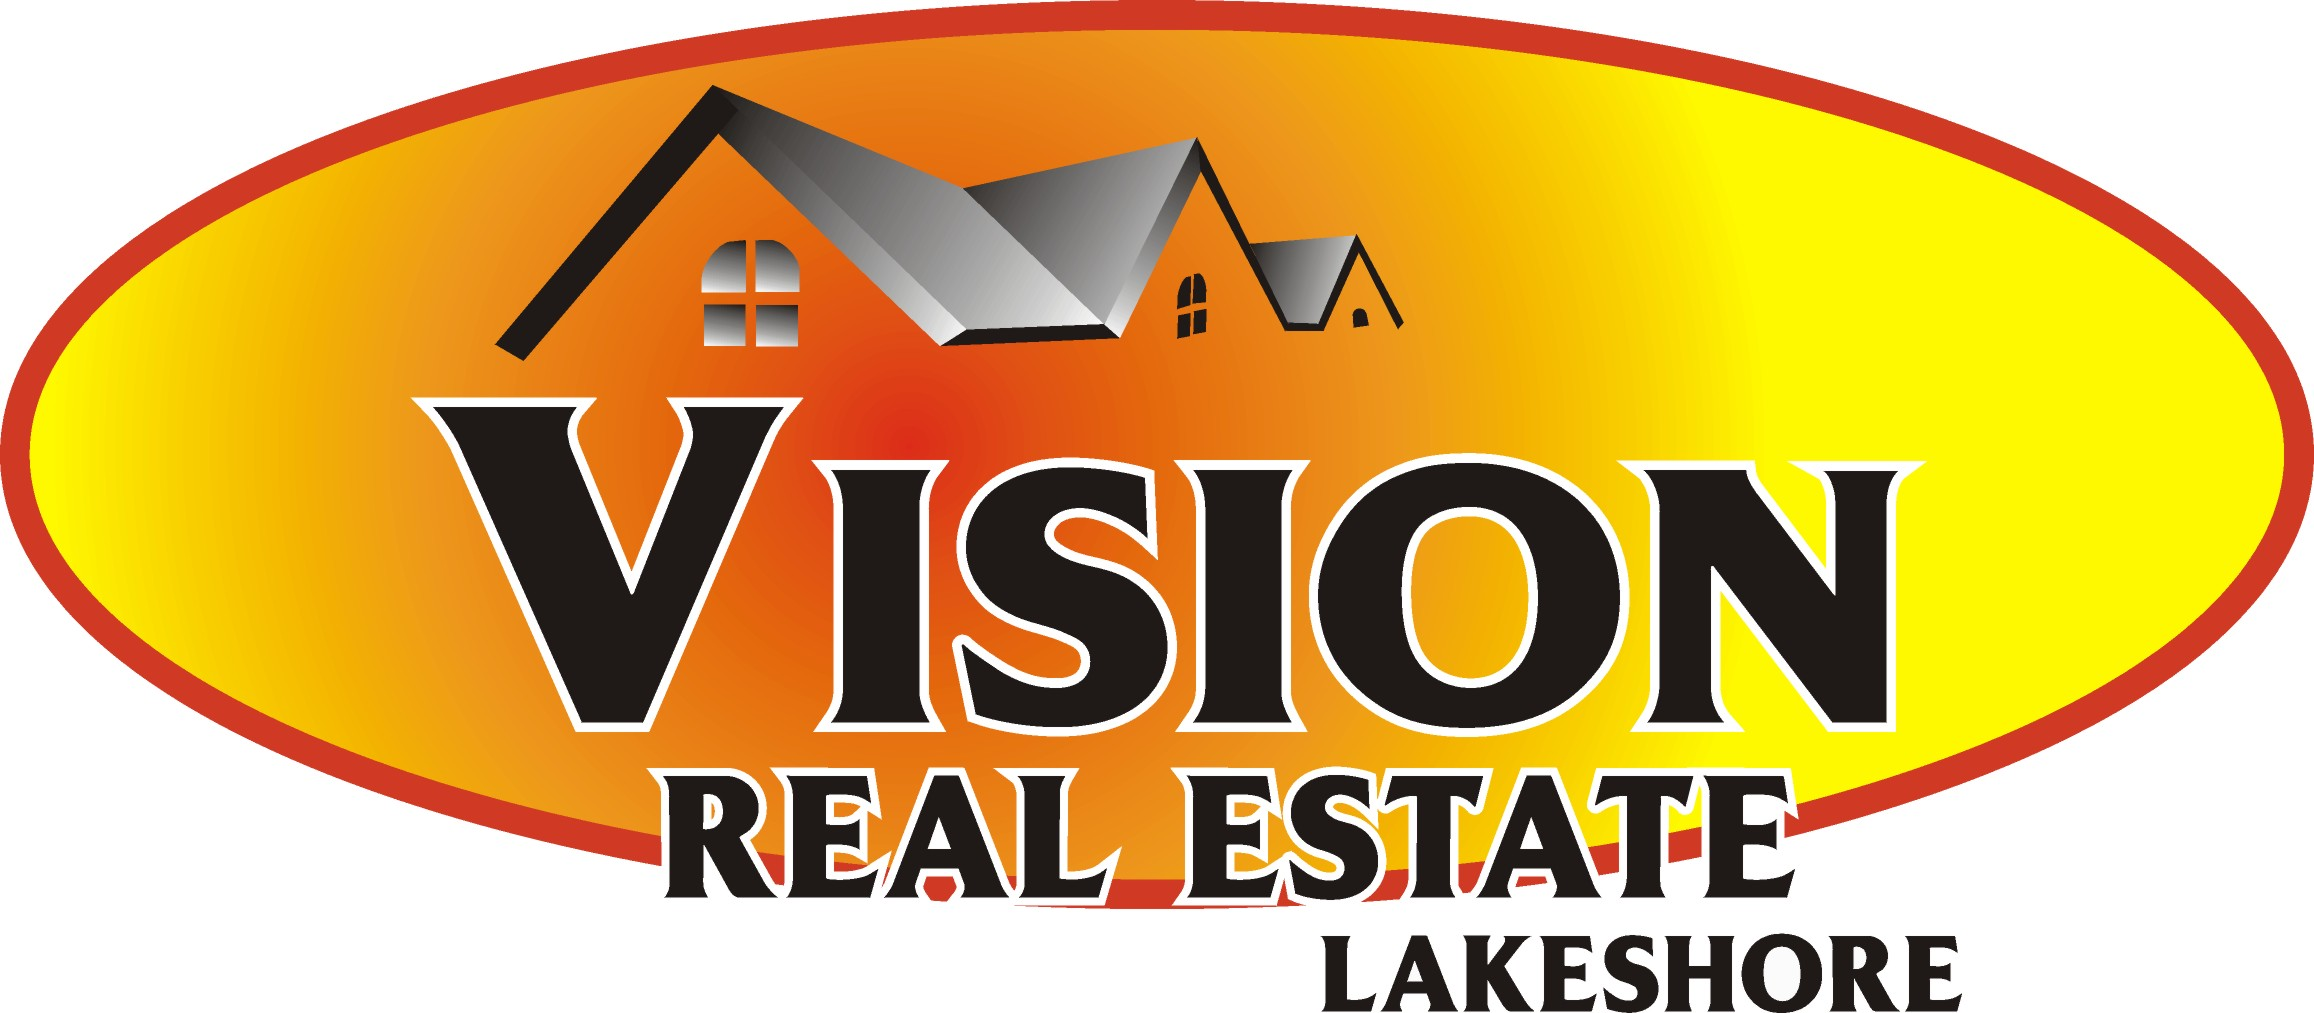 Real Estate News!!! | Paul Dumke | 269-921-1125 | Buchanan